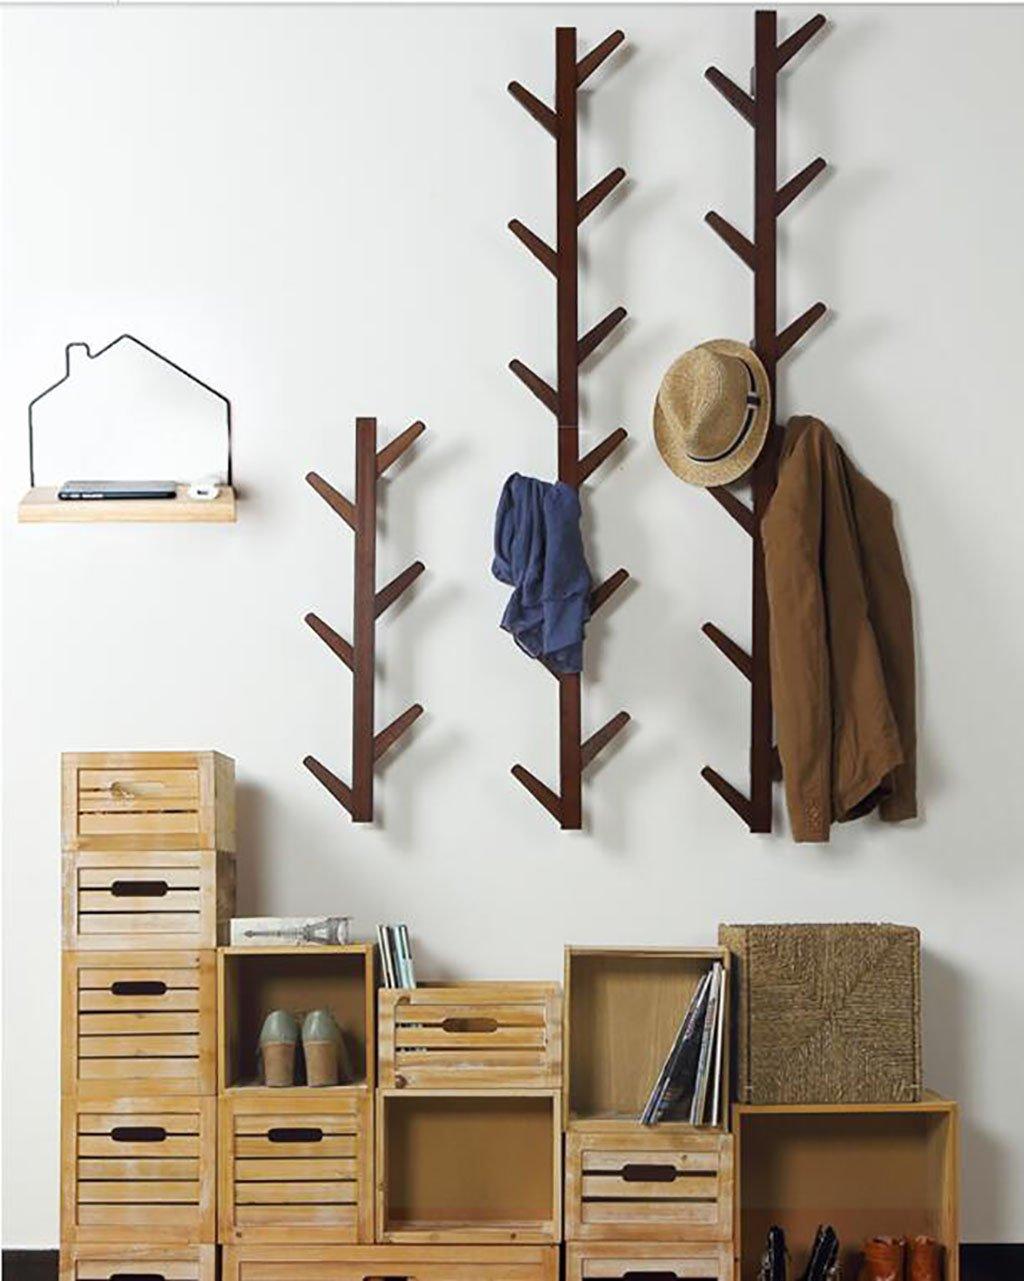 Ymj Coat Rack Garment Hanger Creative On The Wall Solid Wood Hook Hanger Bedroom Wall Living Room Wall Hanger Drying Racks (Color : B, Size : 72278cm) by Ymj (Image #3)